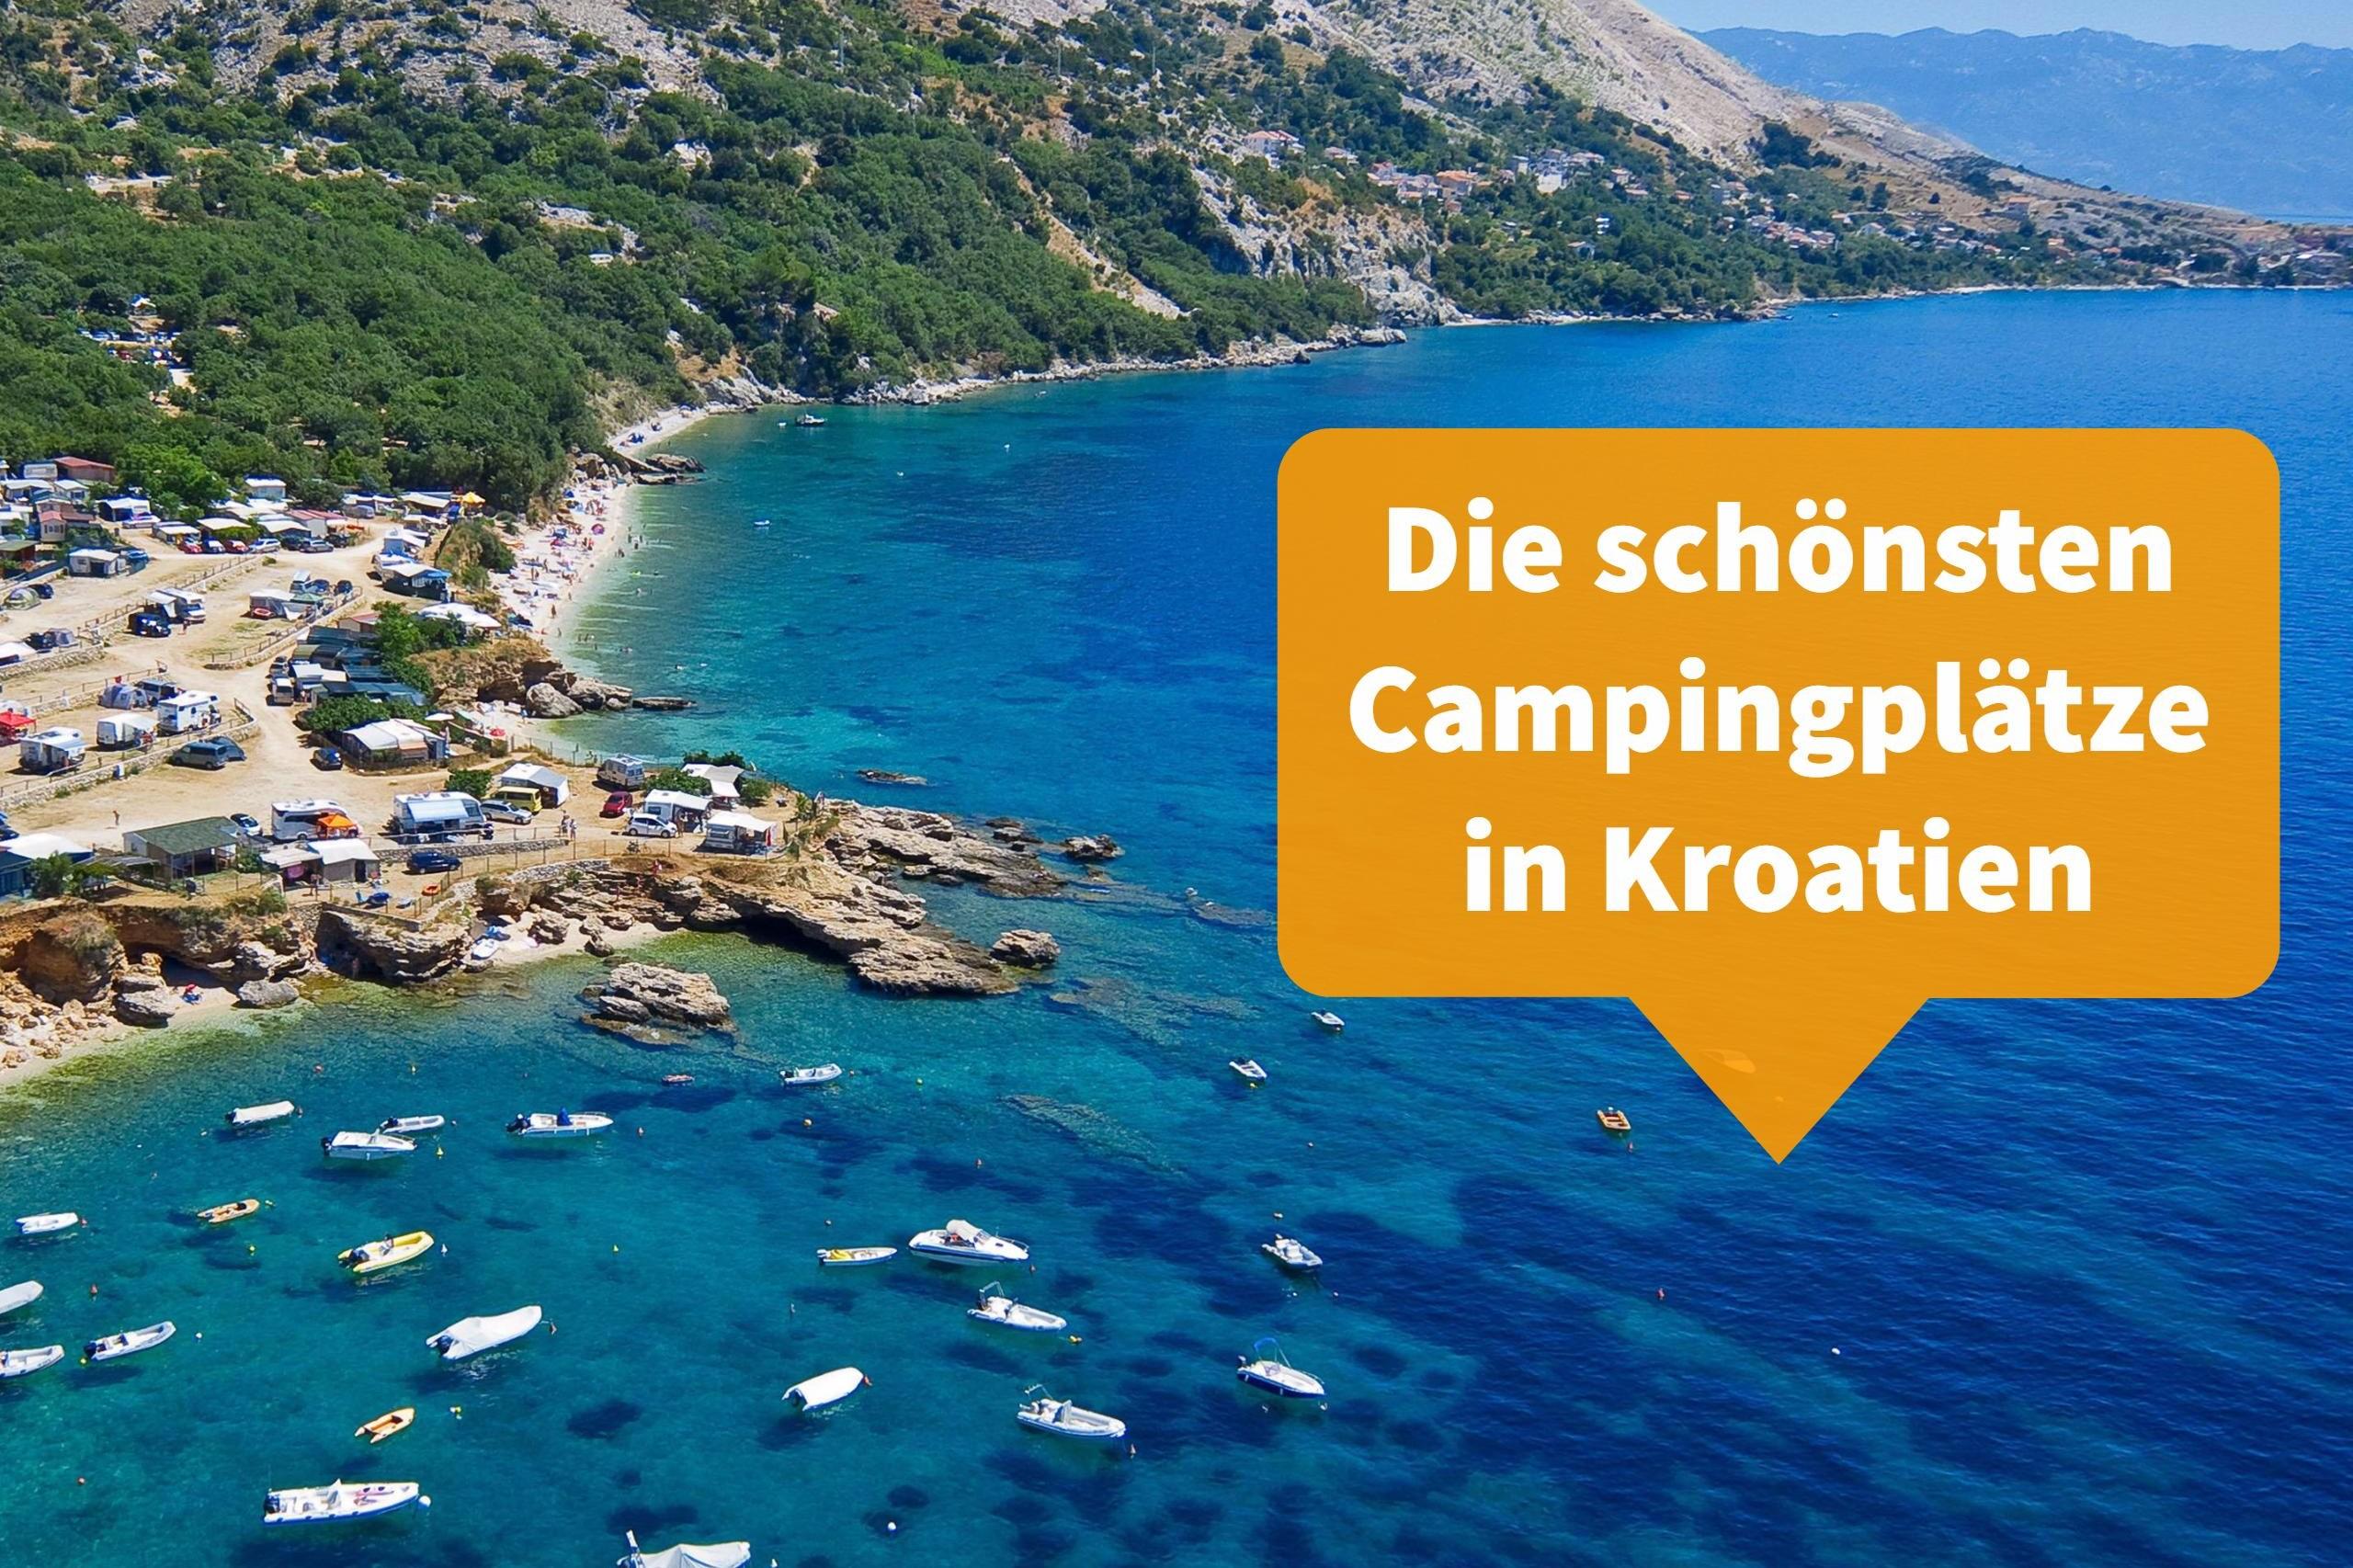 camping in kroatien alle videos der campingpl tze camping street view. Black Bedroom Furniture Sets. Home Design Ideas